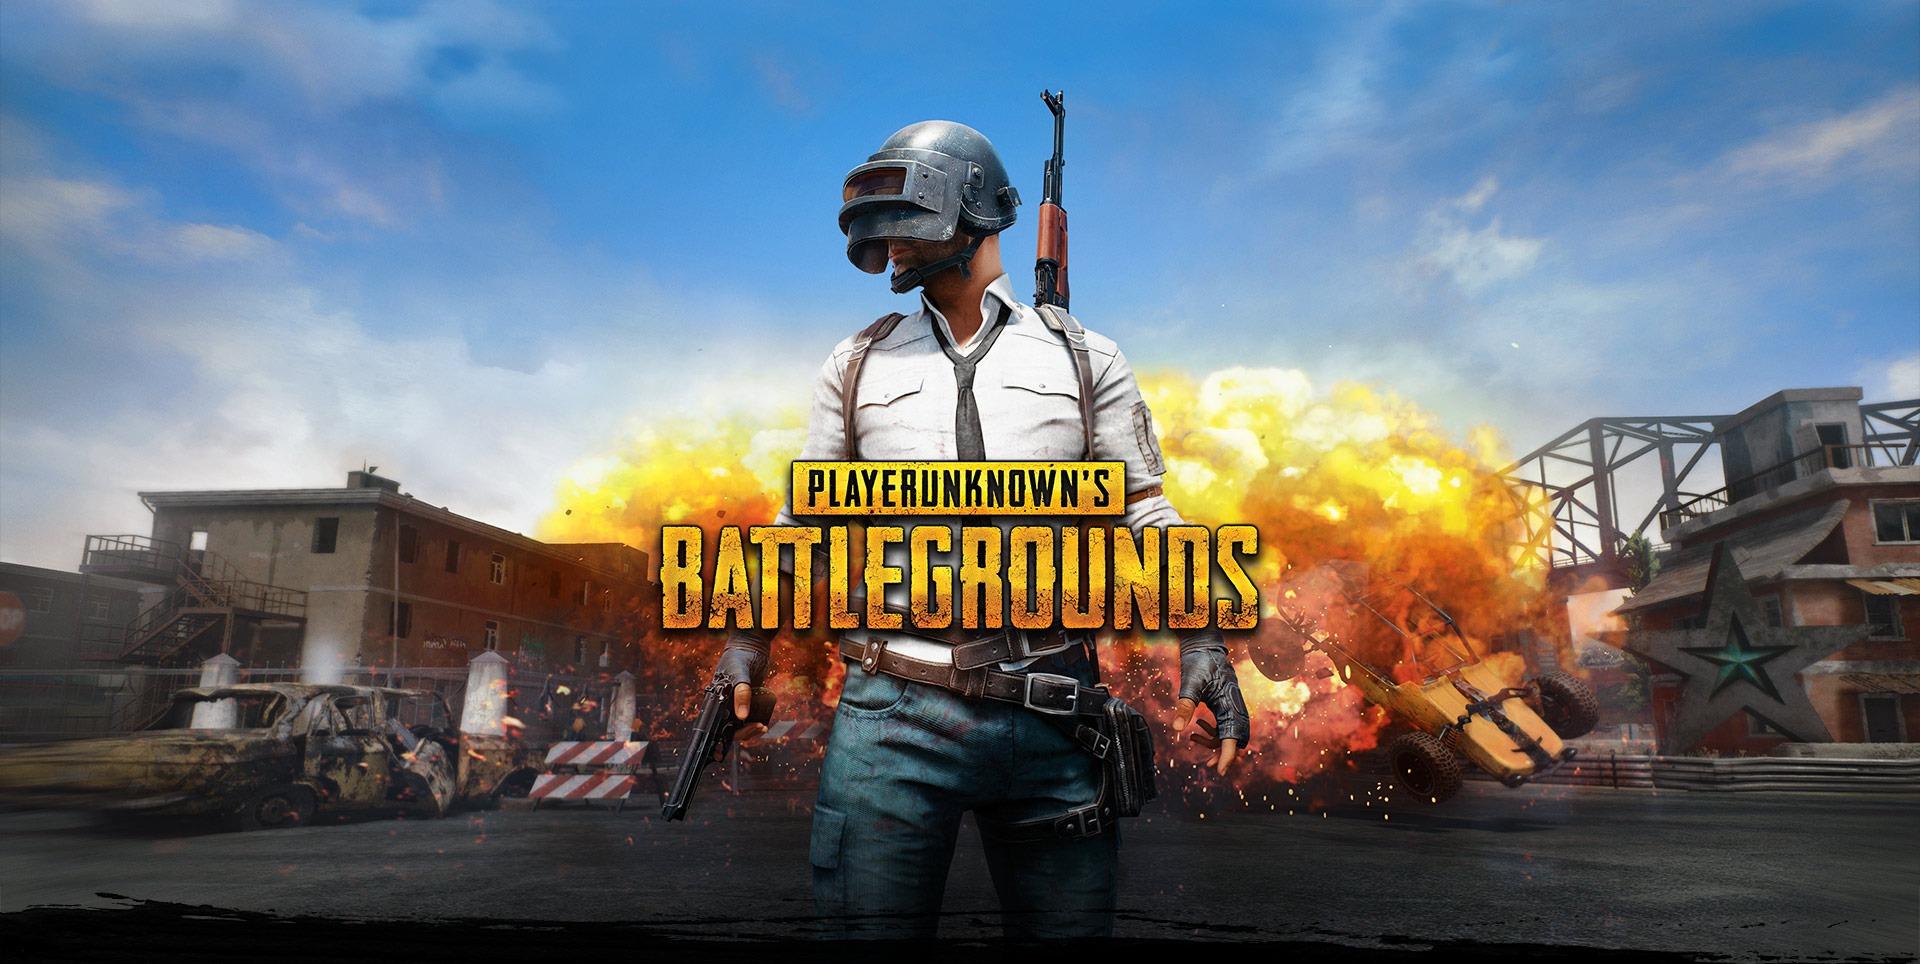 Clones De Playerunknown S Battlegrounds Que Arrasan En: PUBG: 1 Millón De Jugadores En 48 Horas